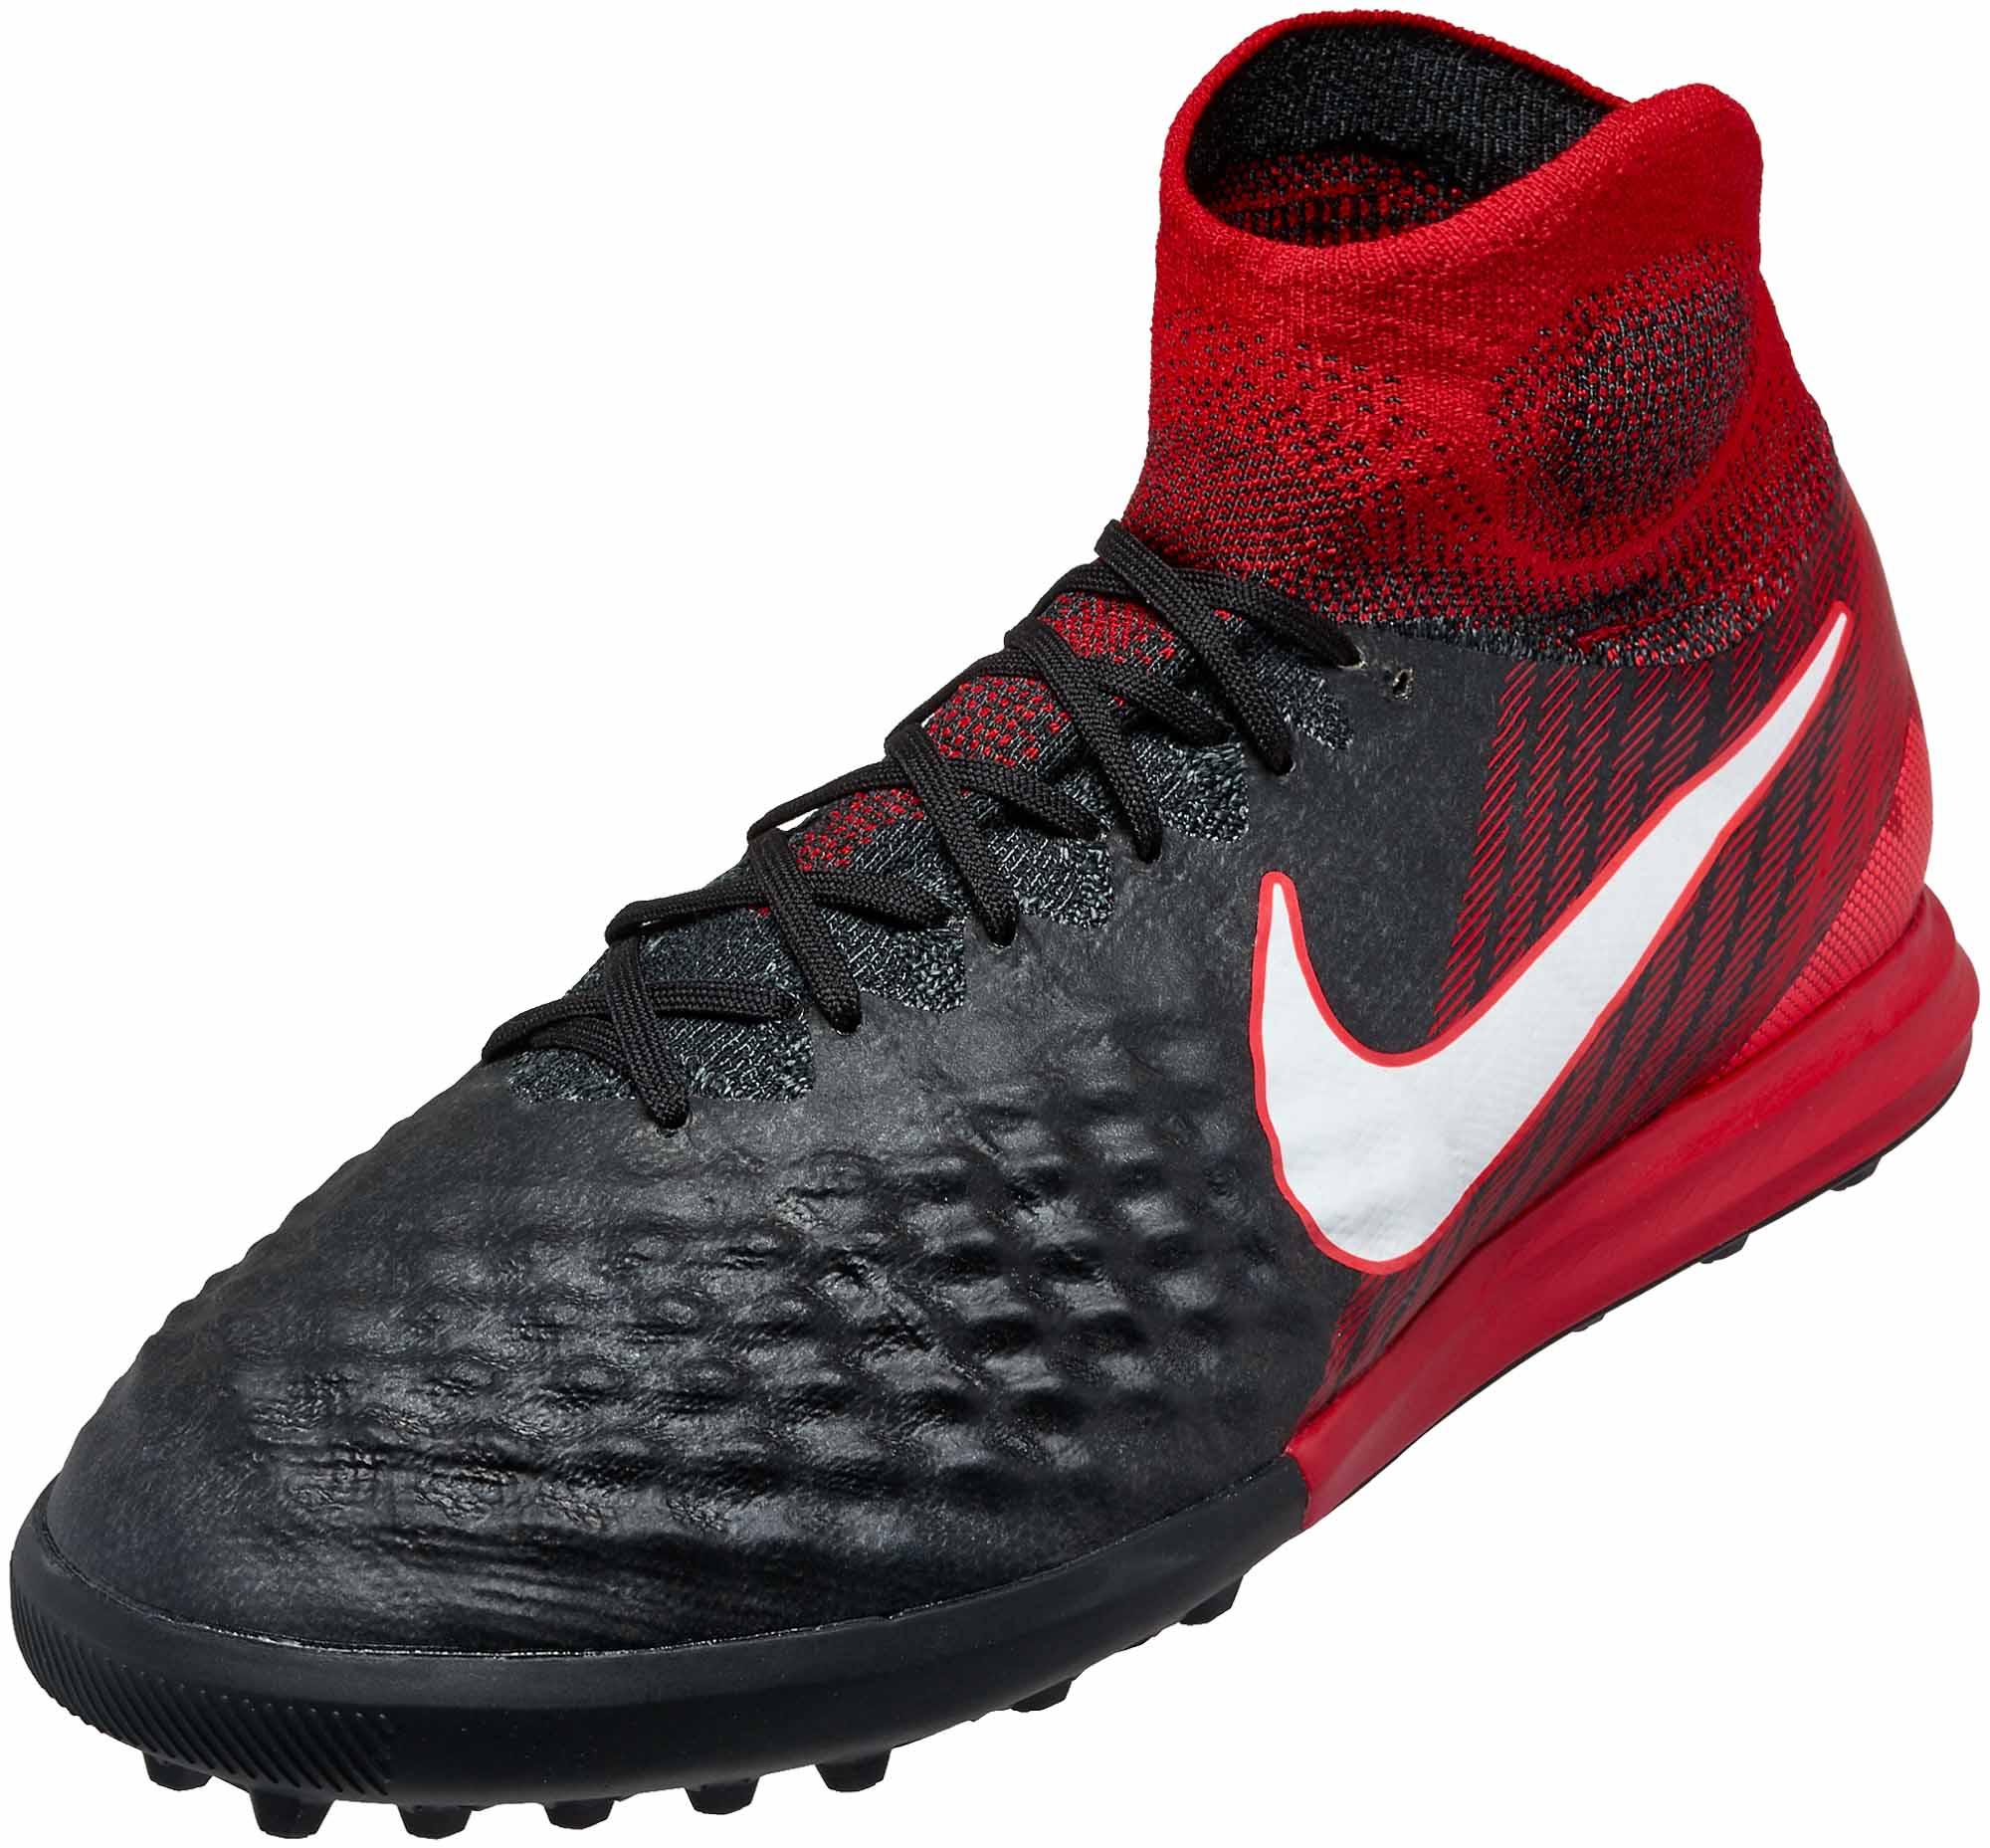 e624ba0dc3a9 Nike MagistaX Proximo II TF - Black   White